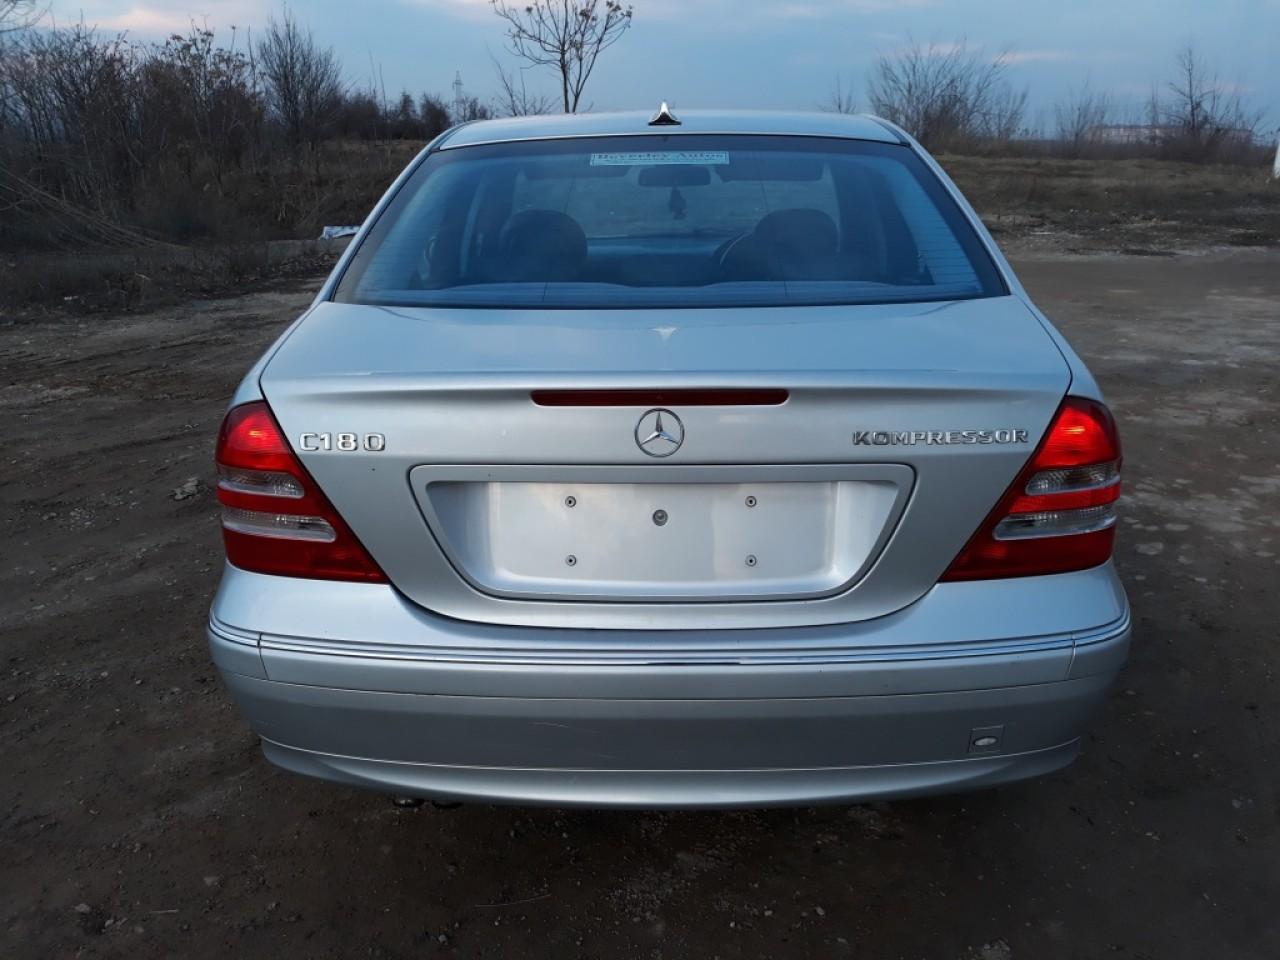 Cotiera Mercedes C-CLASS W203 2004 berlina 1.8